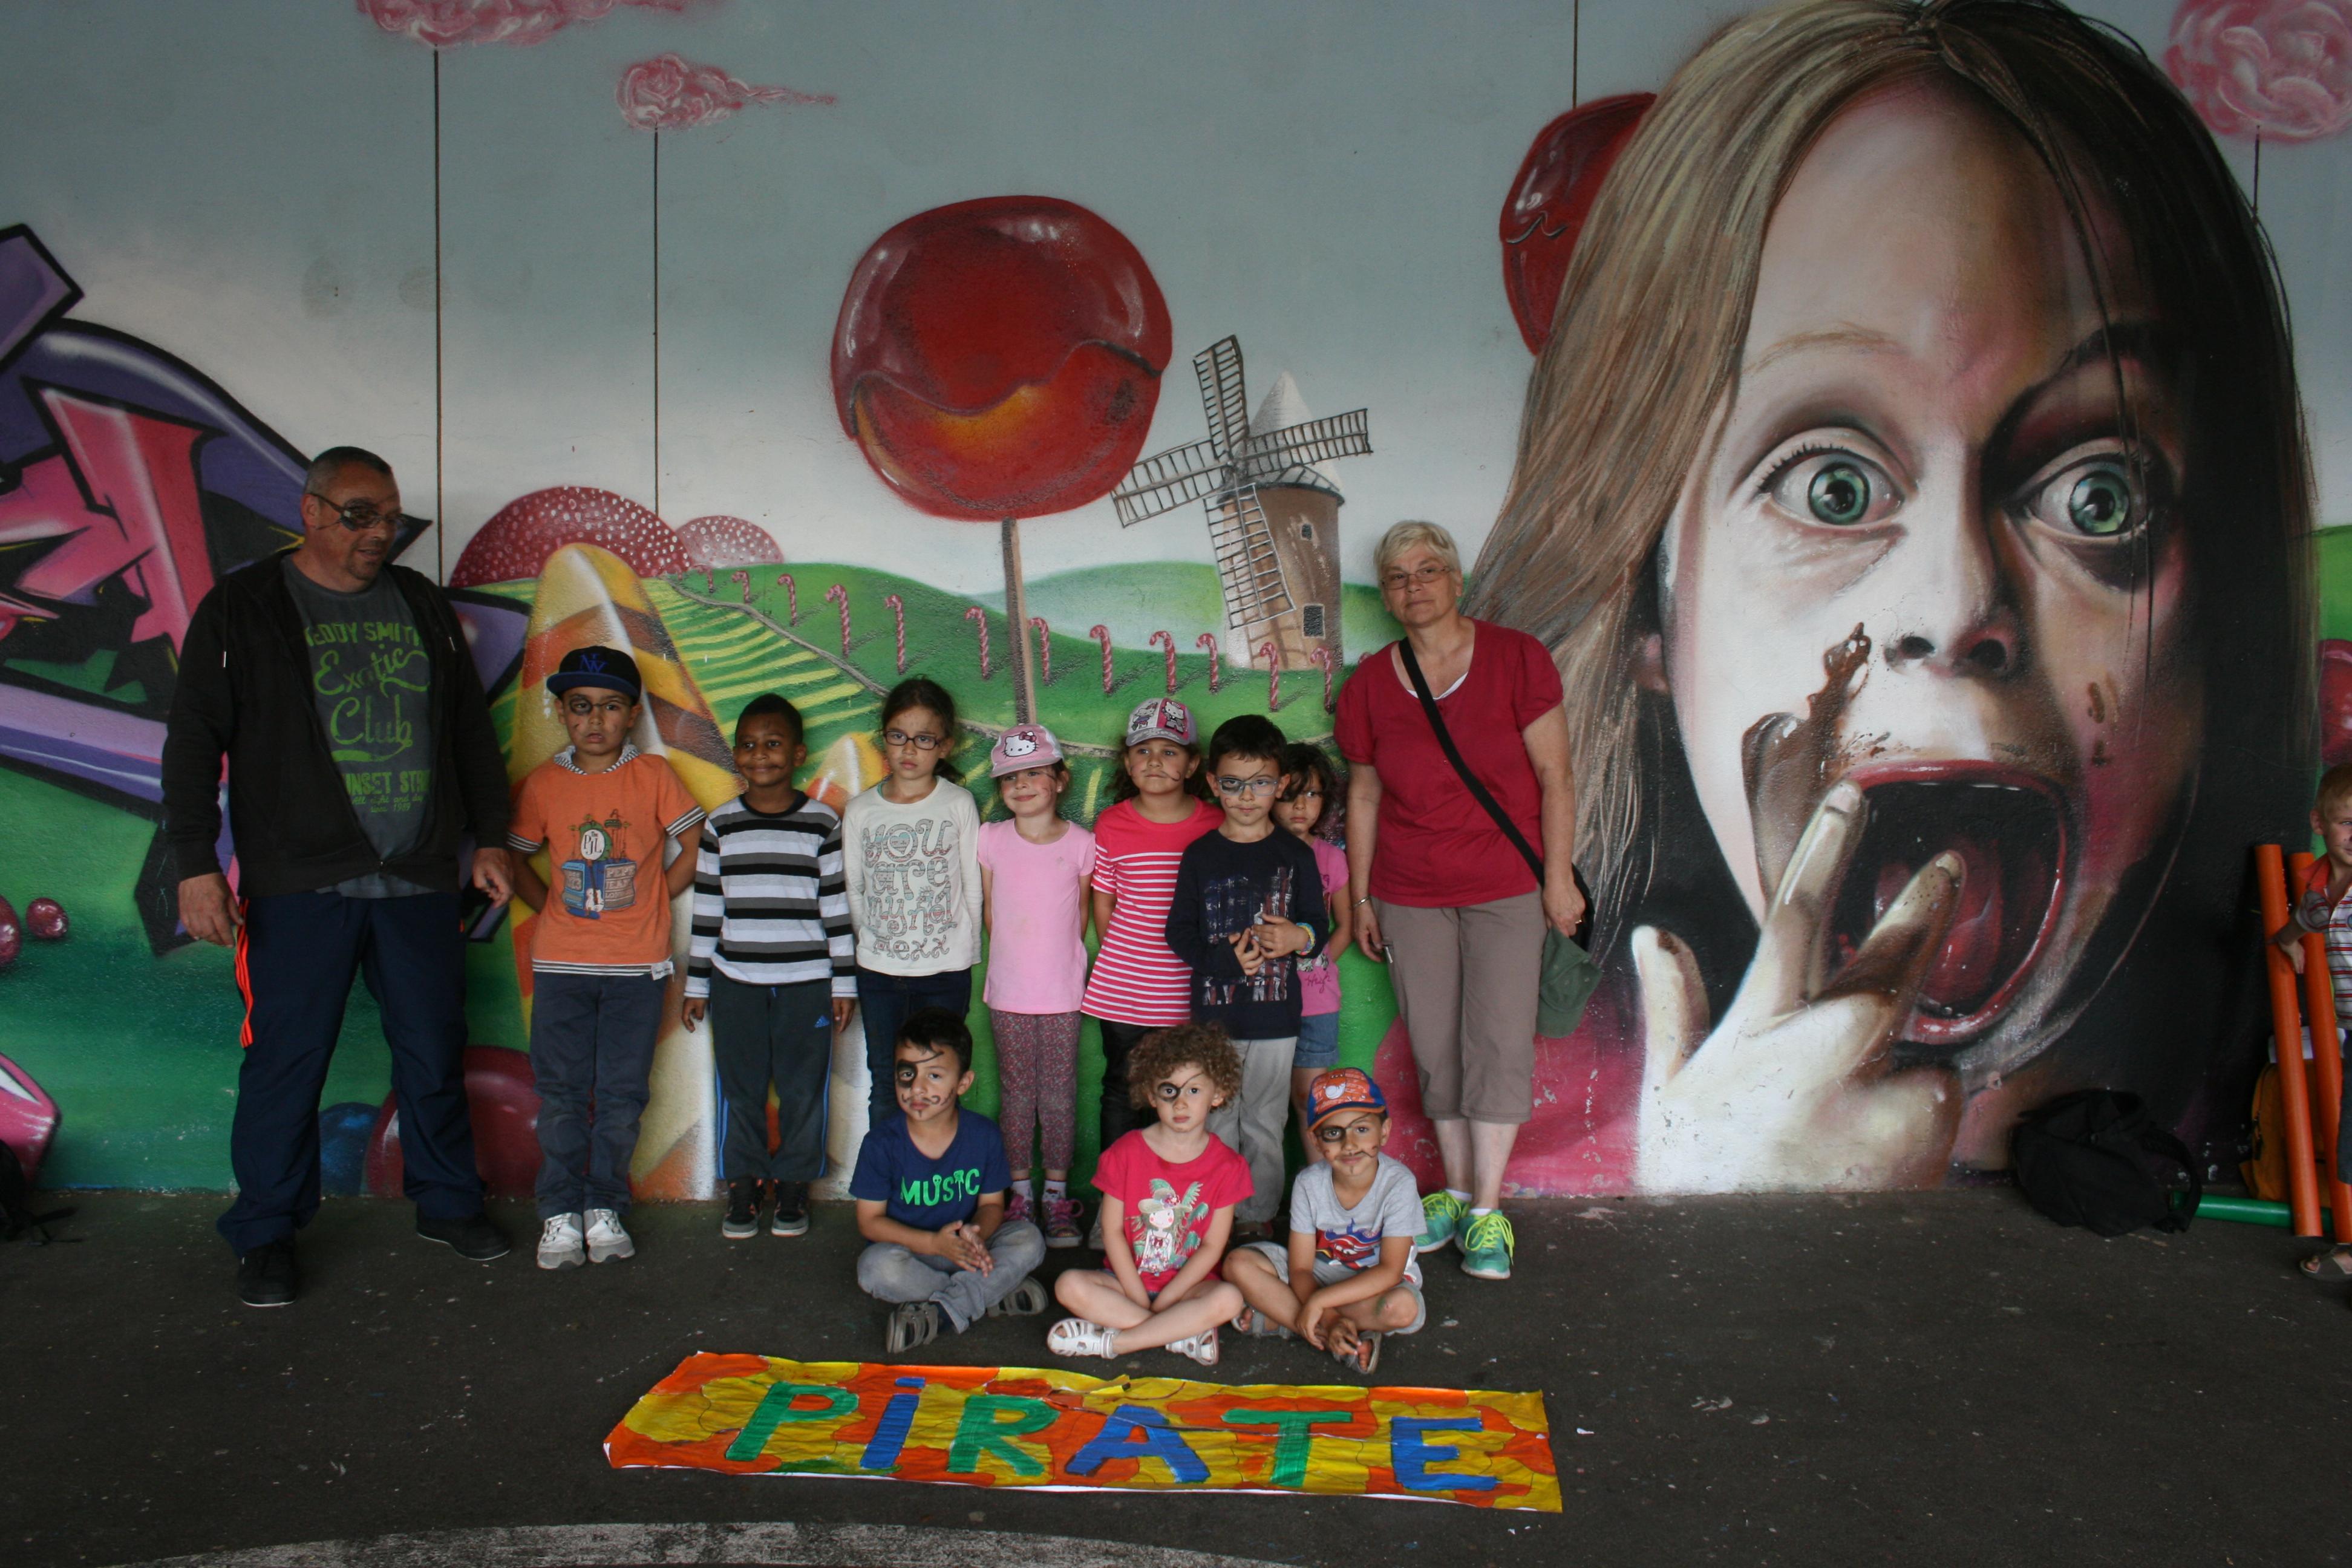 JOURNEE GRAND JEU CENTRE DE LOISIRS lundi 7 juillet